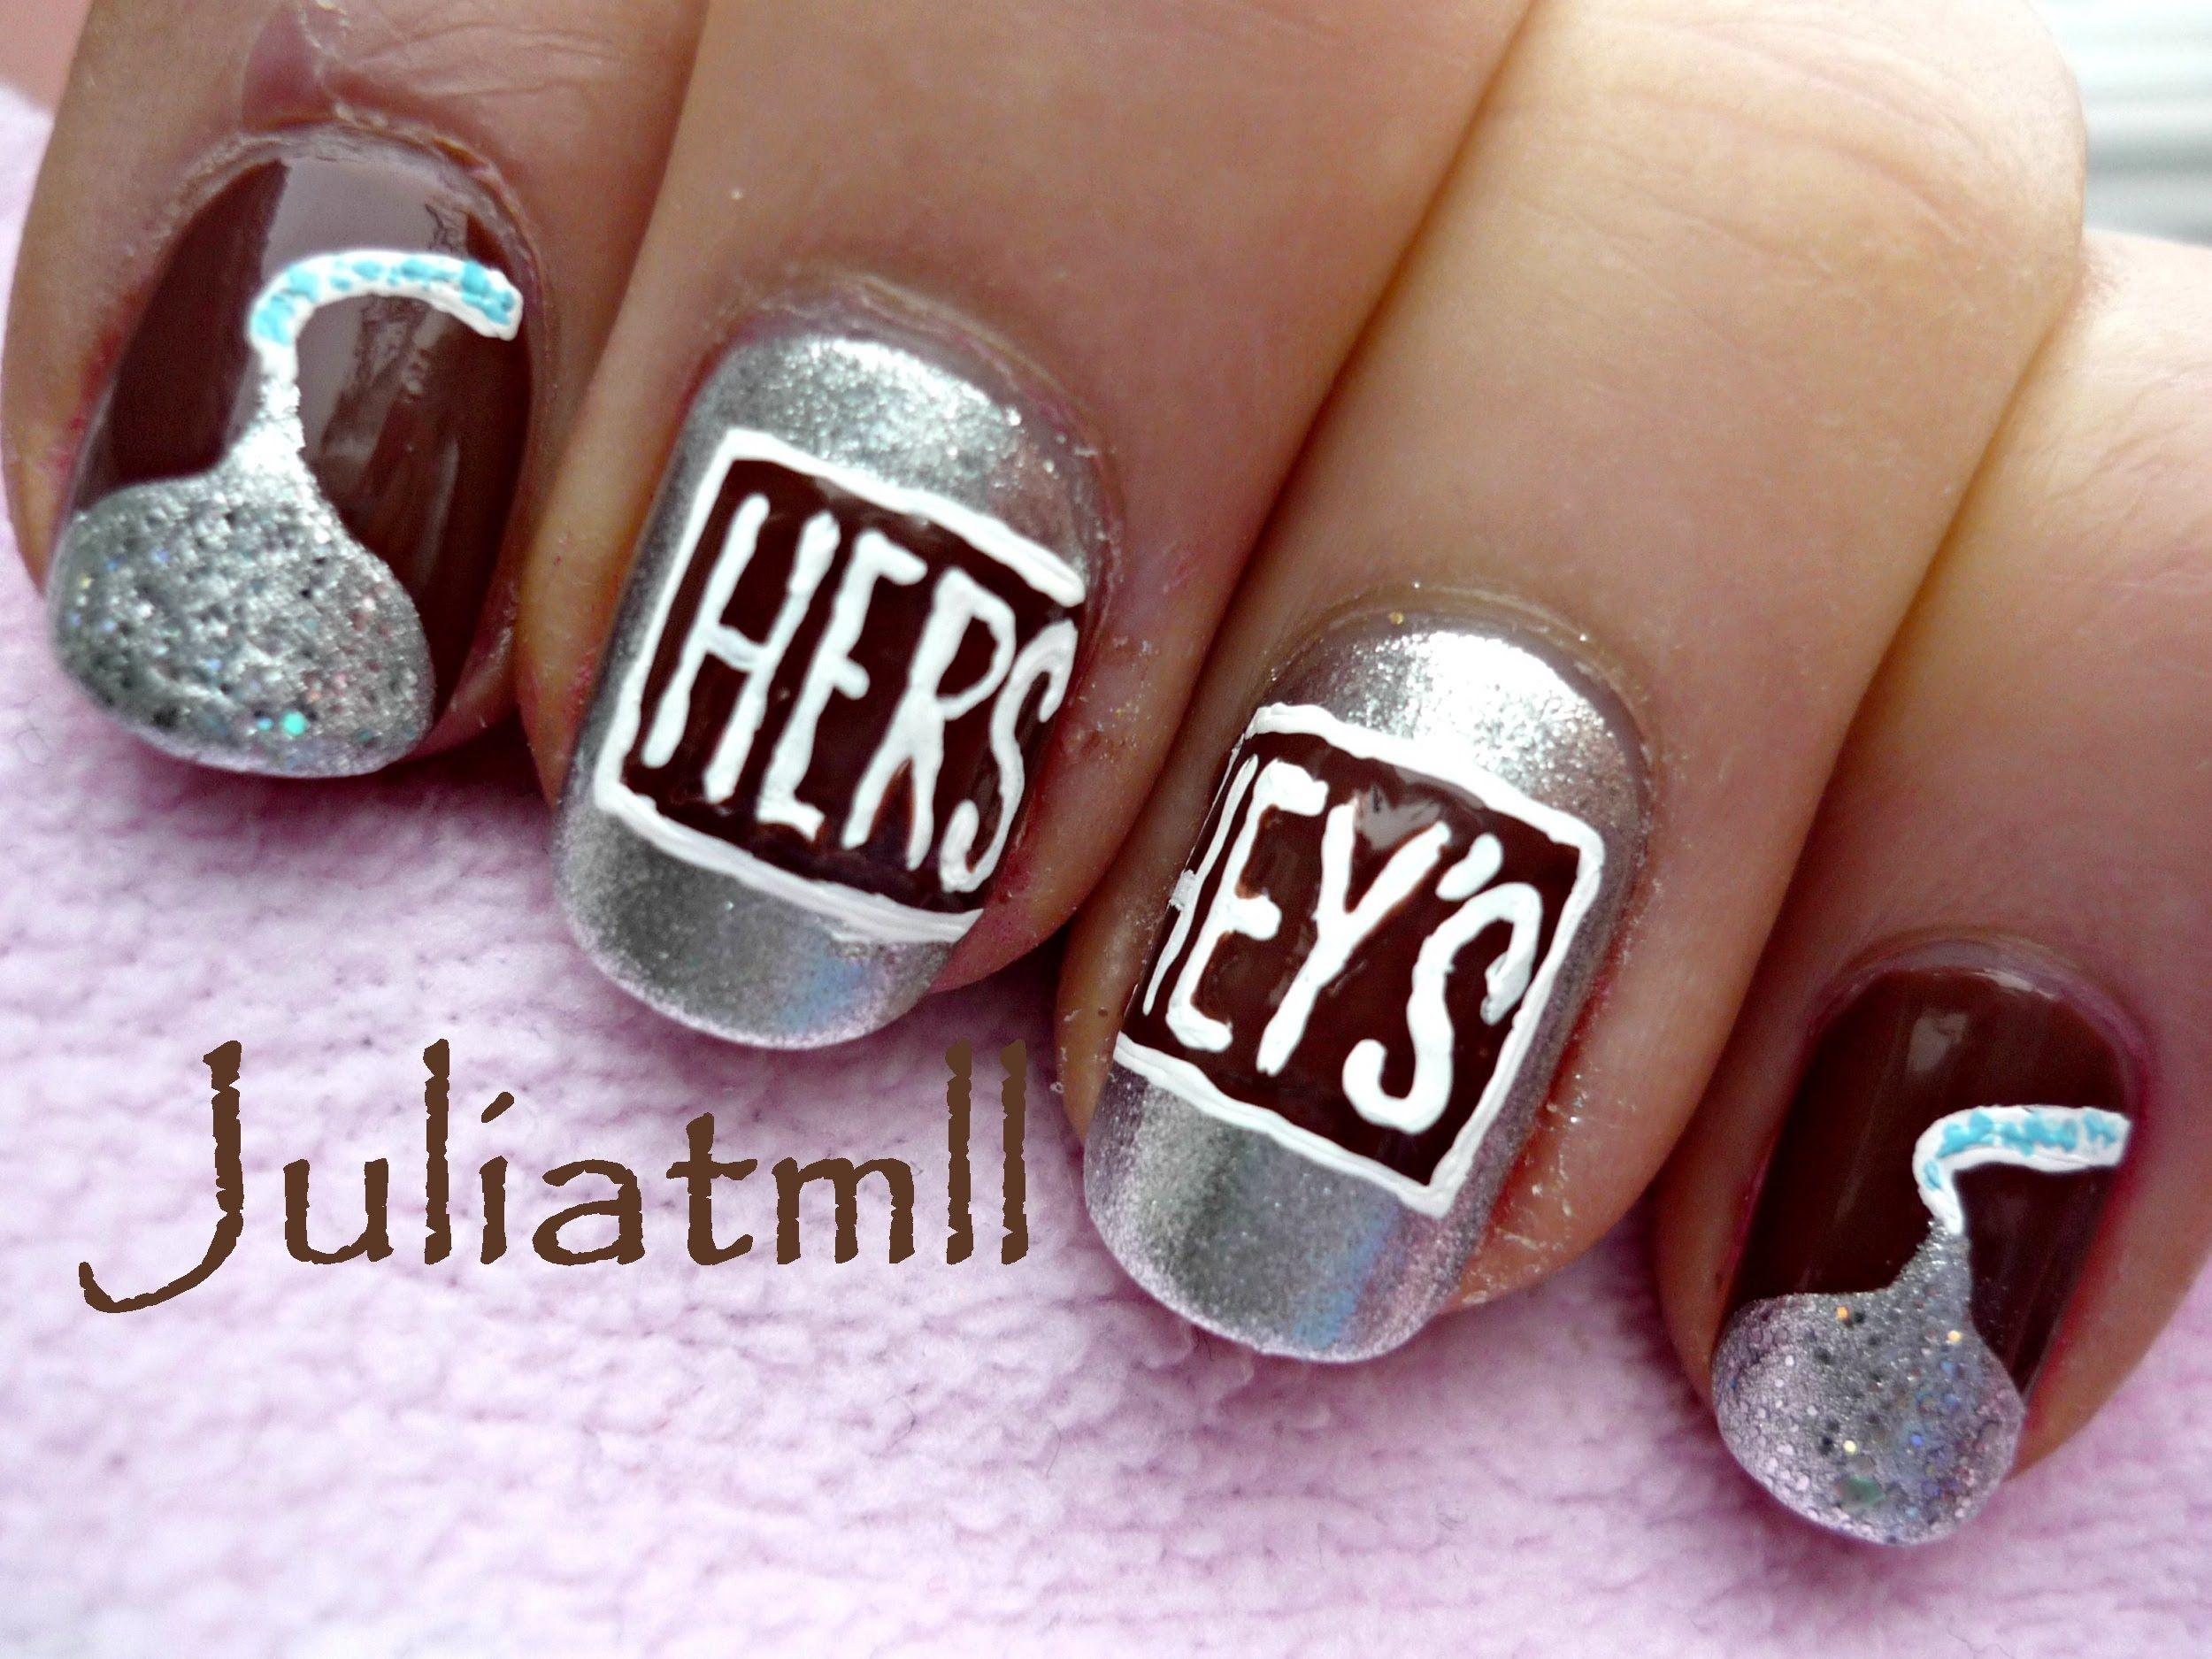 Chocolate hersheys kisses nail art ongles pinterest kiss chocolate hersheys kisses nail art prinsesfo Images